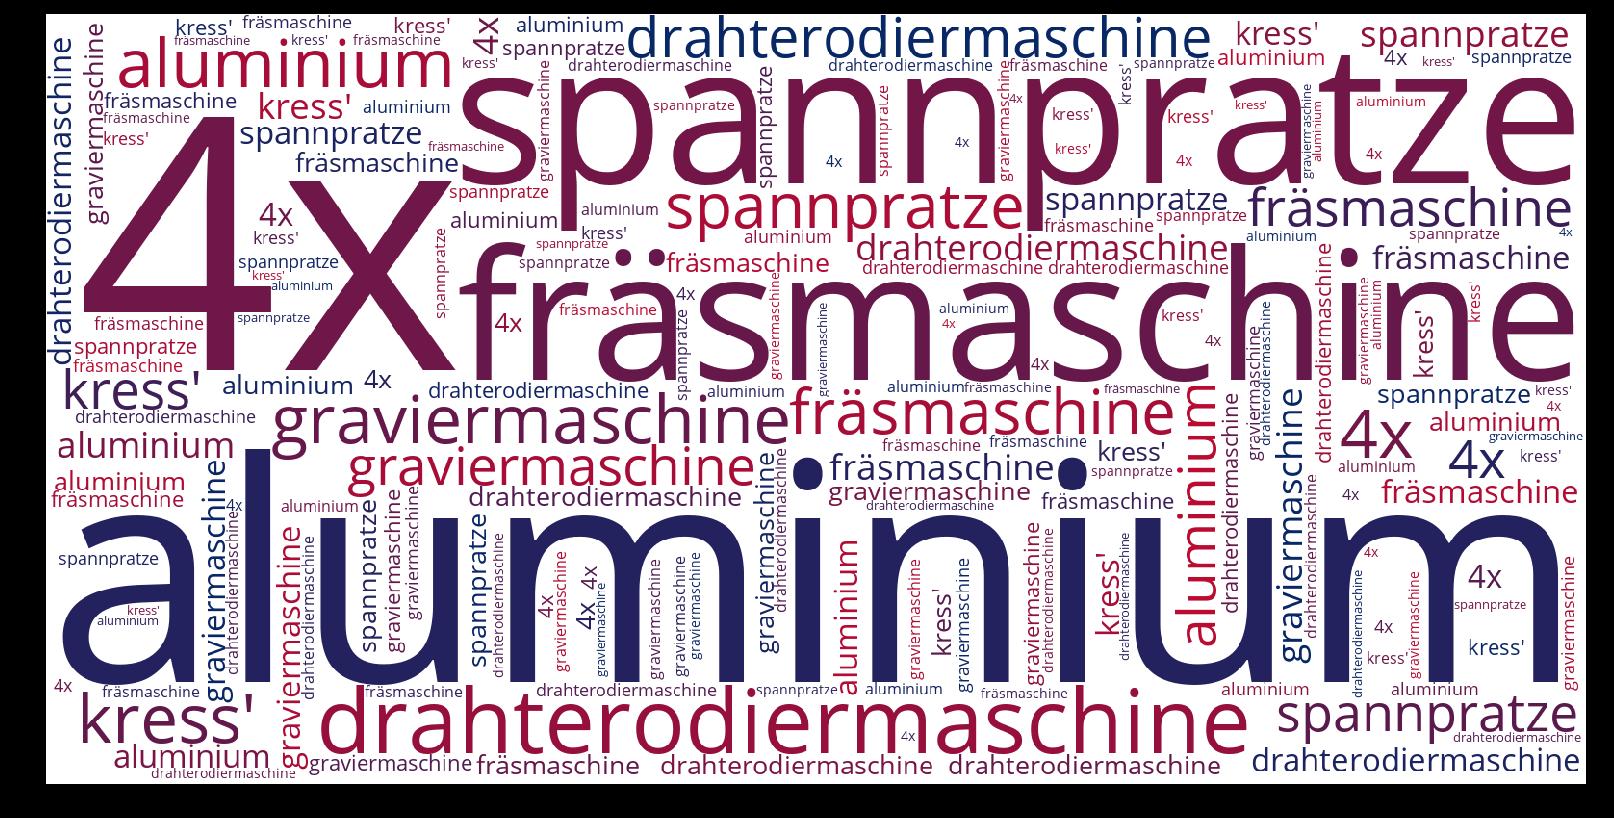 Drahterodiermaschine-wordcloud